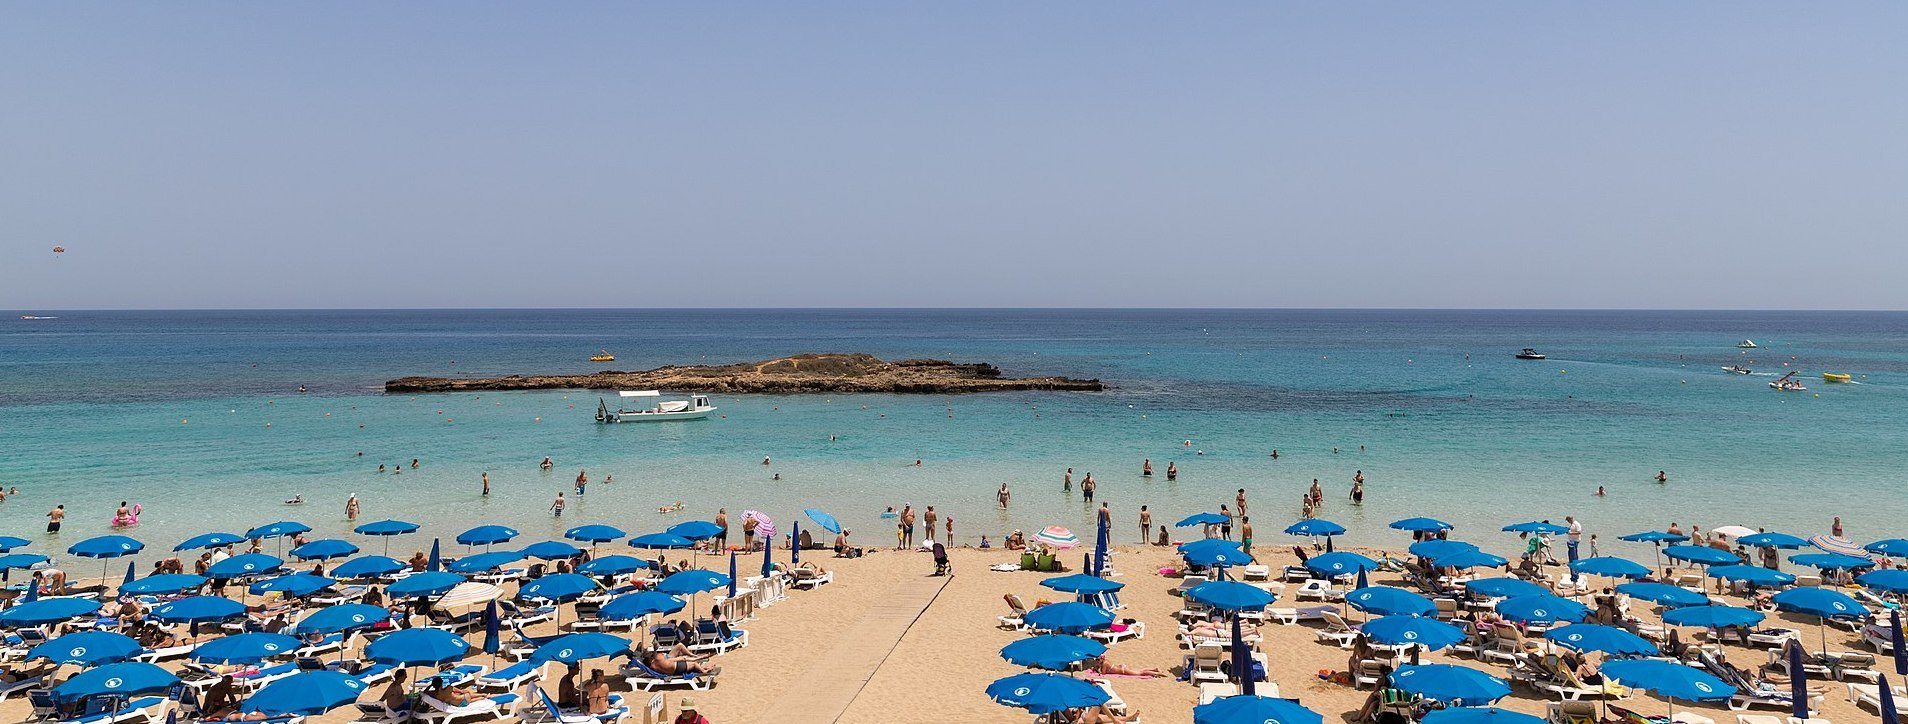 Beaches Cyprus